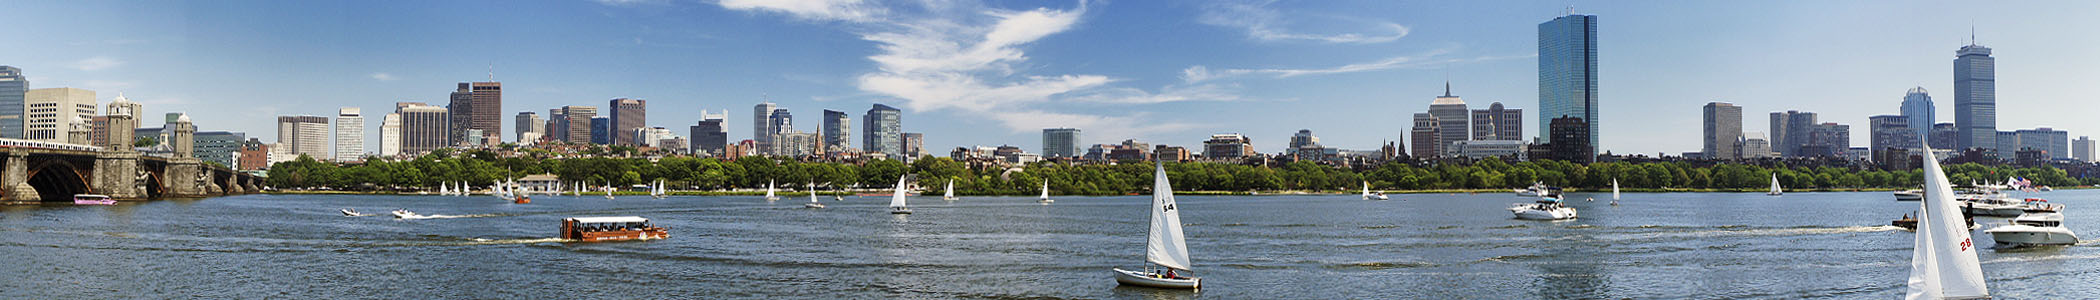 Boston  U2013 Travel Guide At Wikivoyage